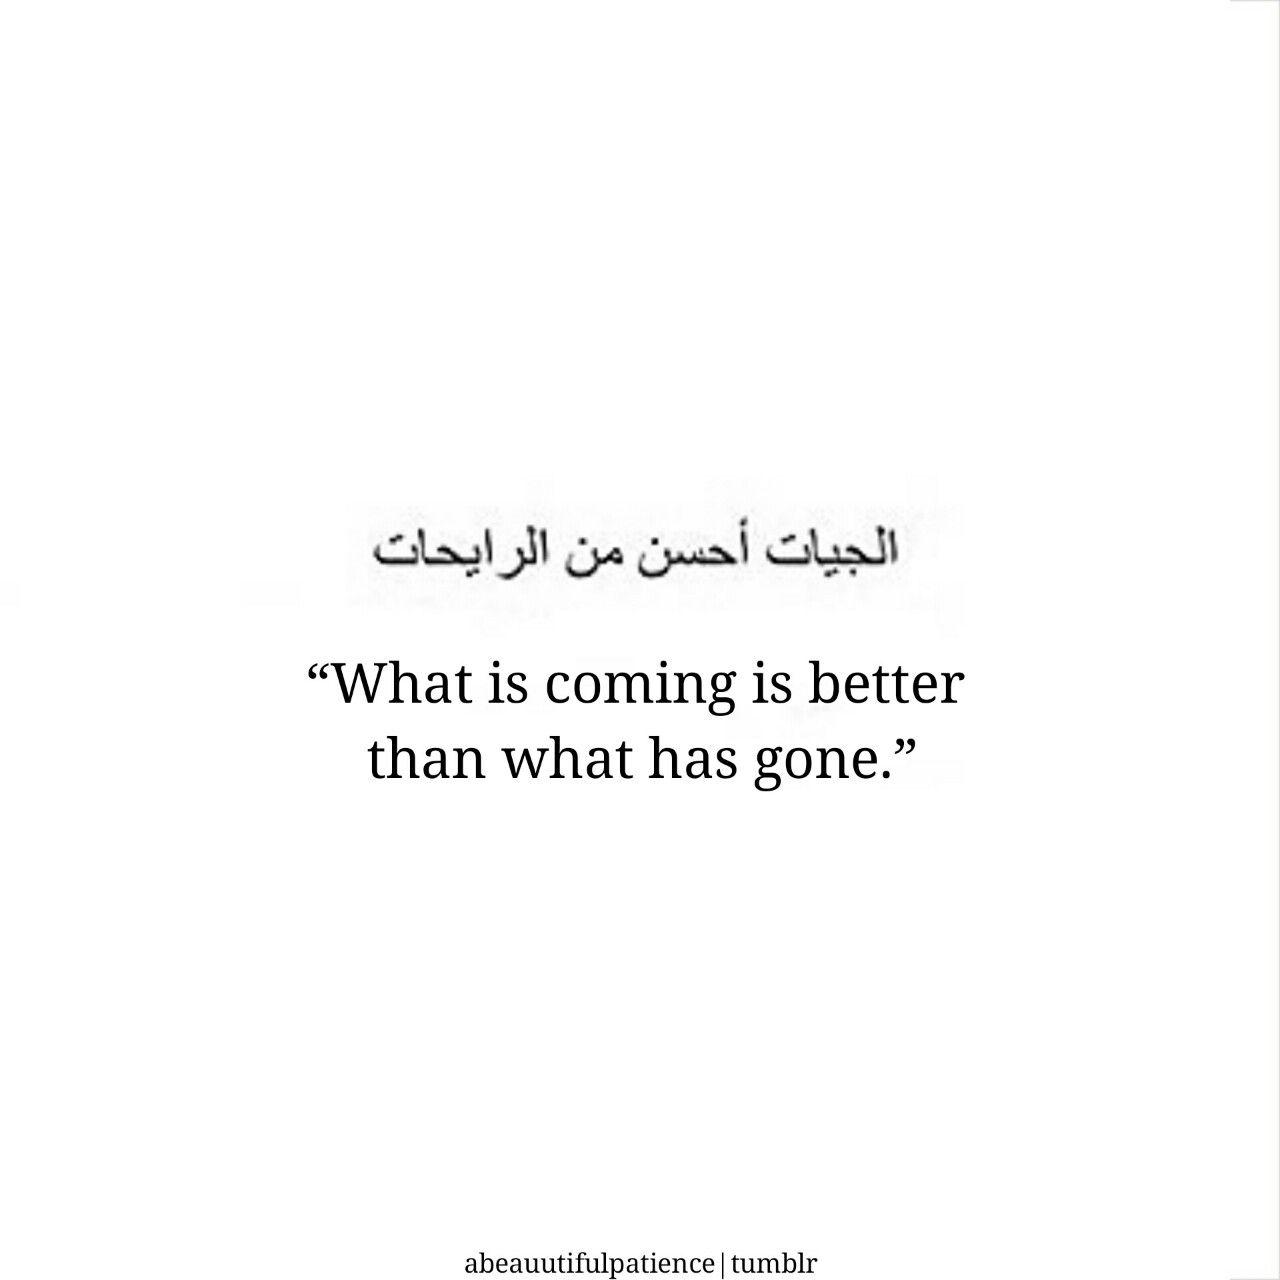 Arabic Tattoo Quotes Translation: Arabic Proverb, Arabic